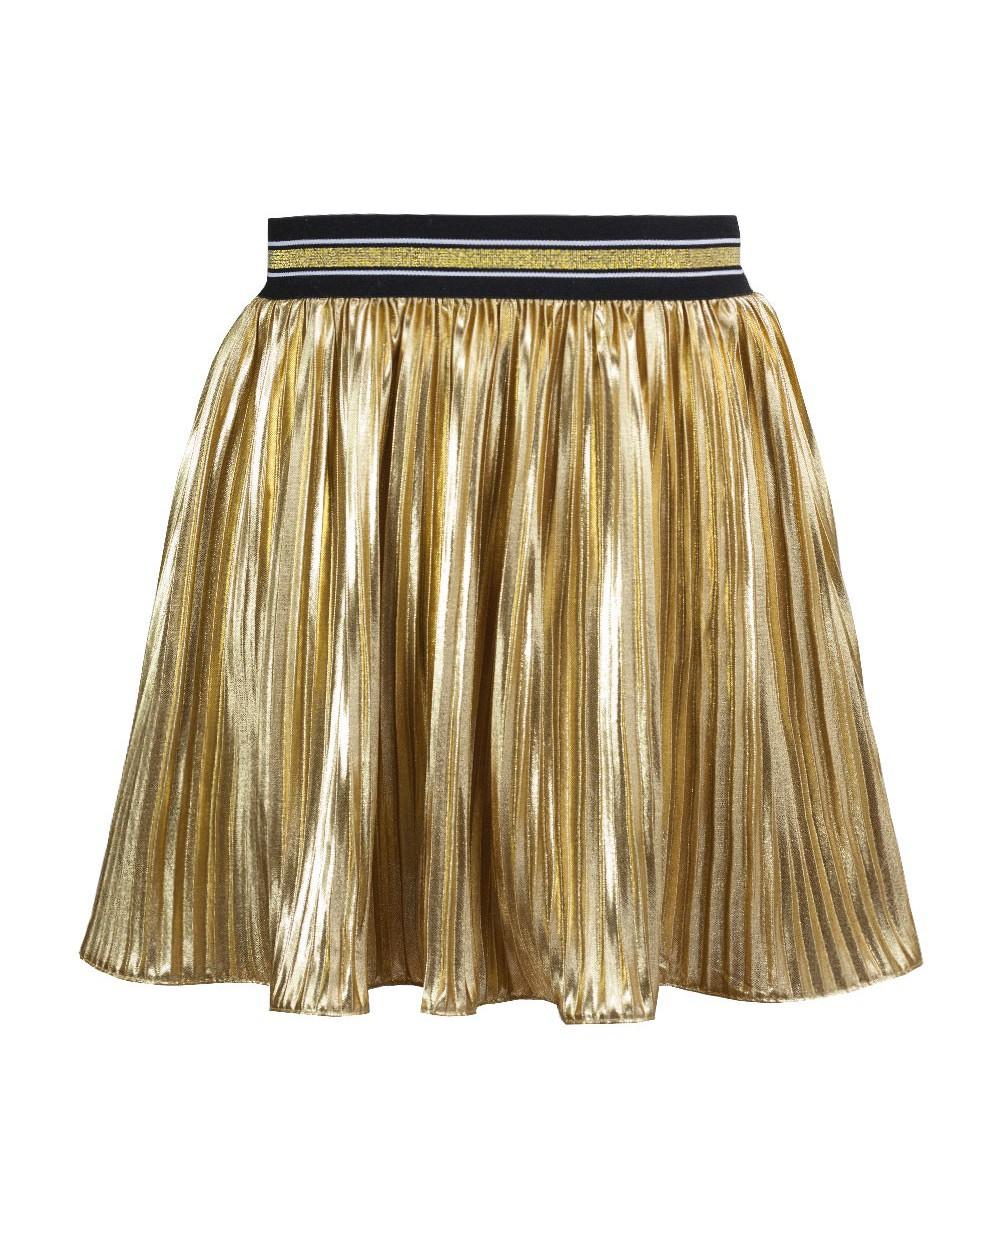 Spódnica Agnes złota